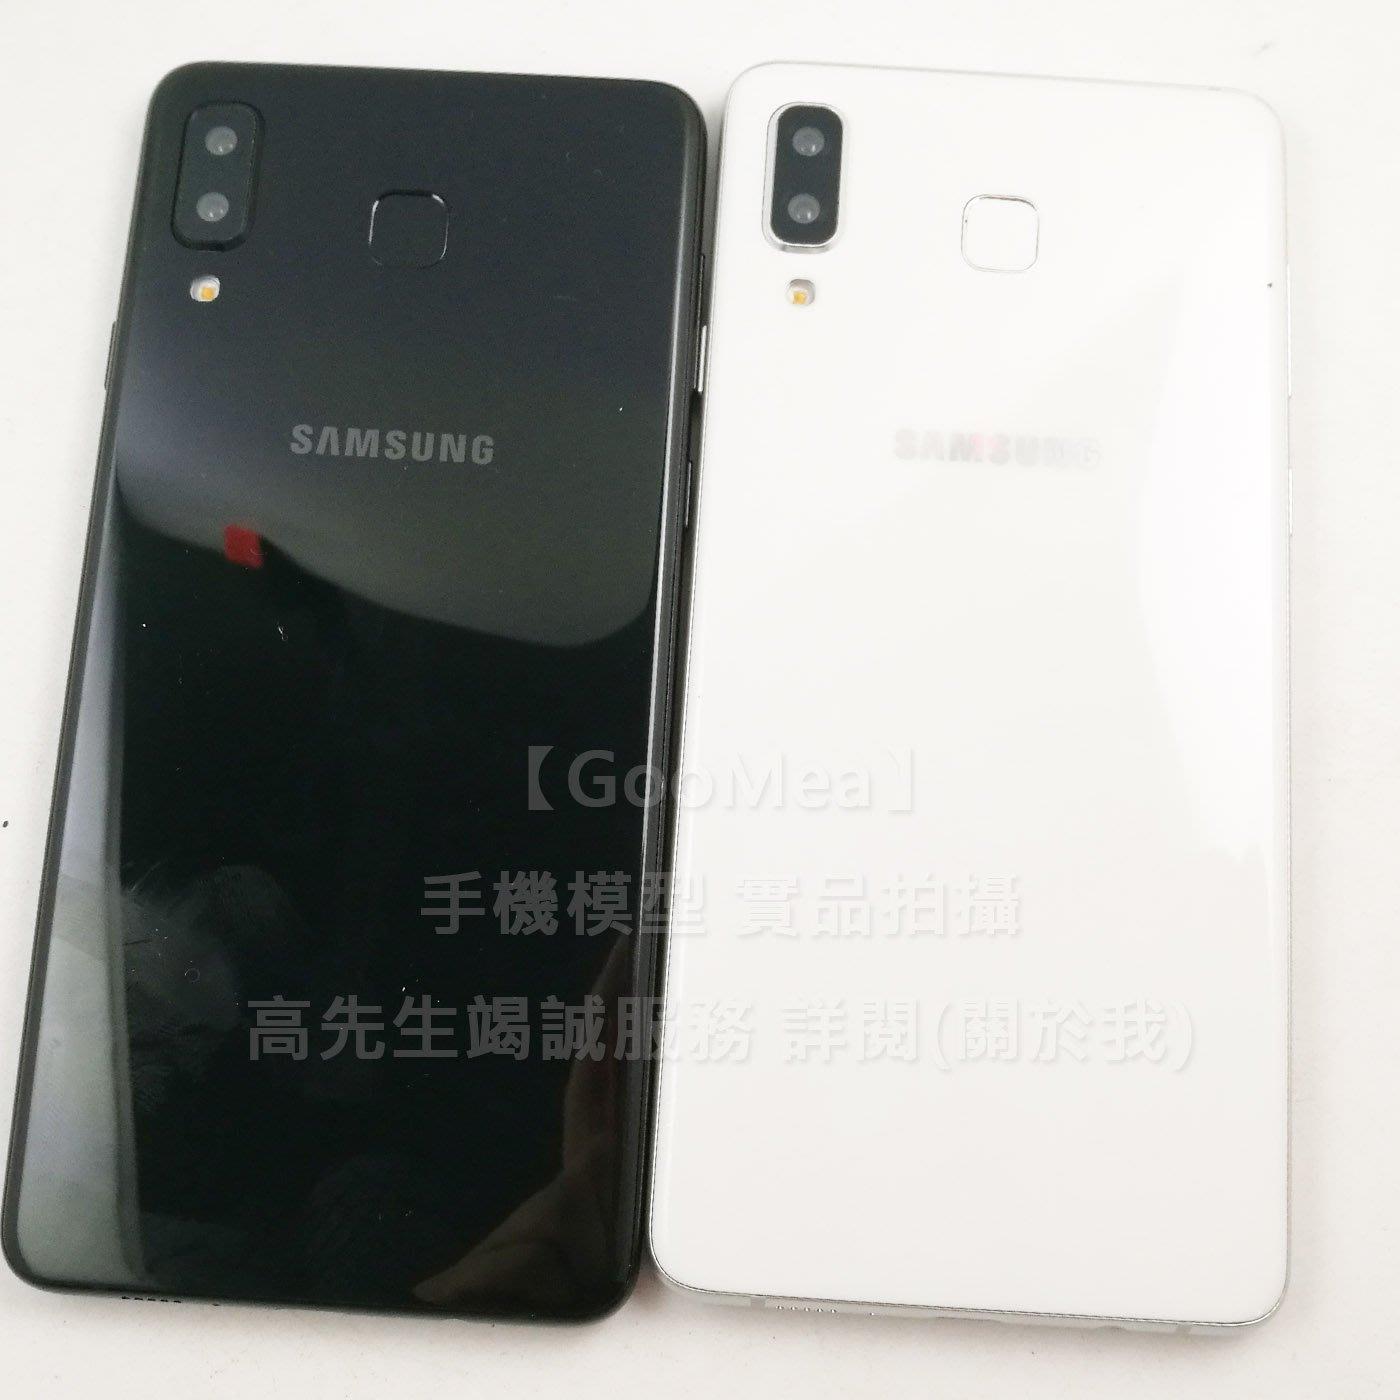 【GooMea】原裝 金屬 黑屏Samsung三星 A9 star 6.3吋模型展示樣品包膜dummy摔機整人假機交差1